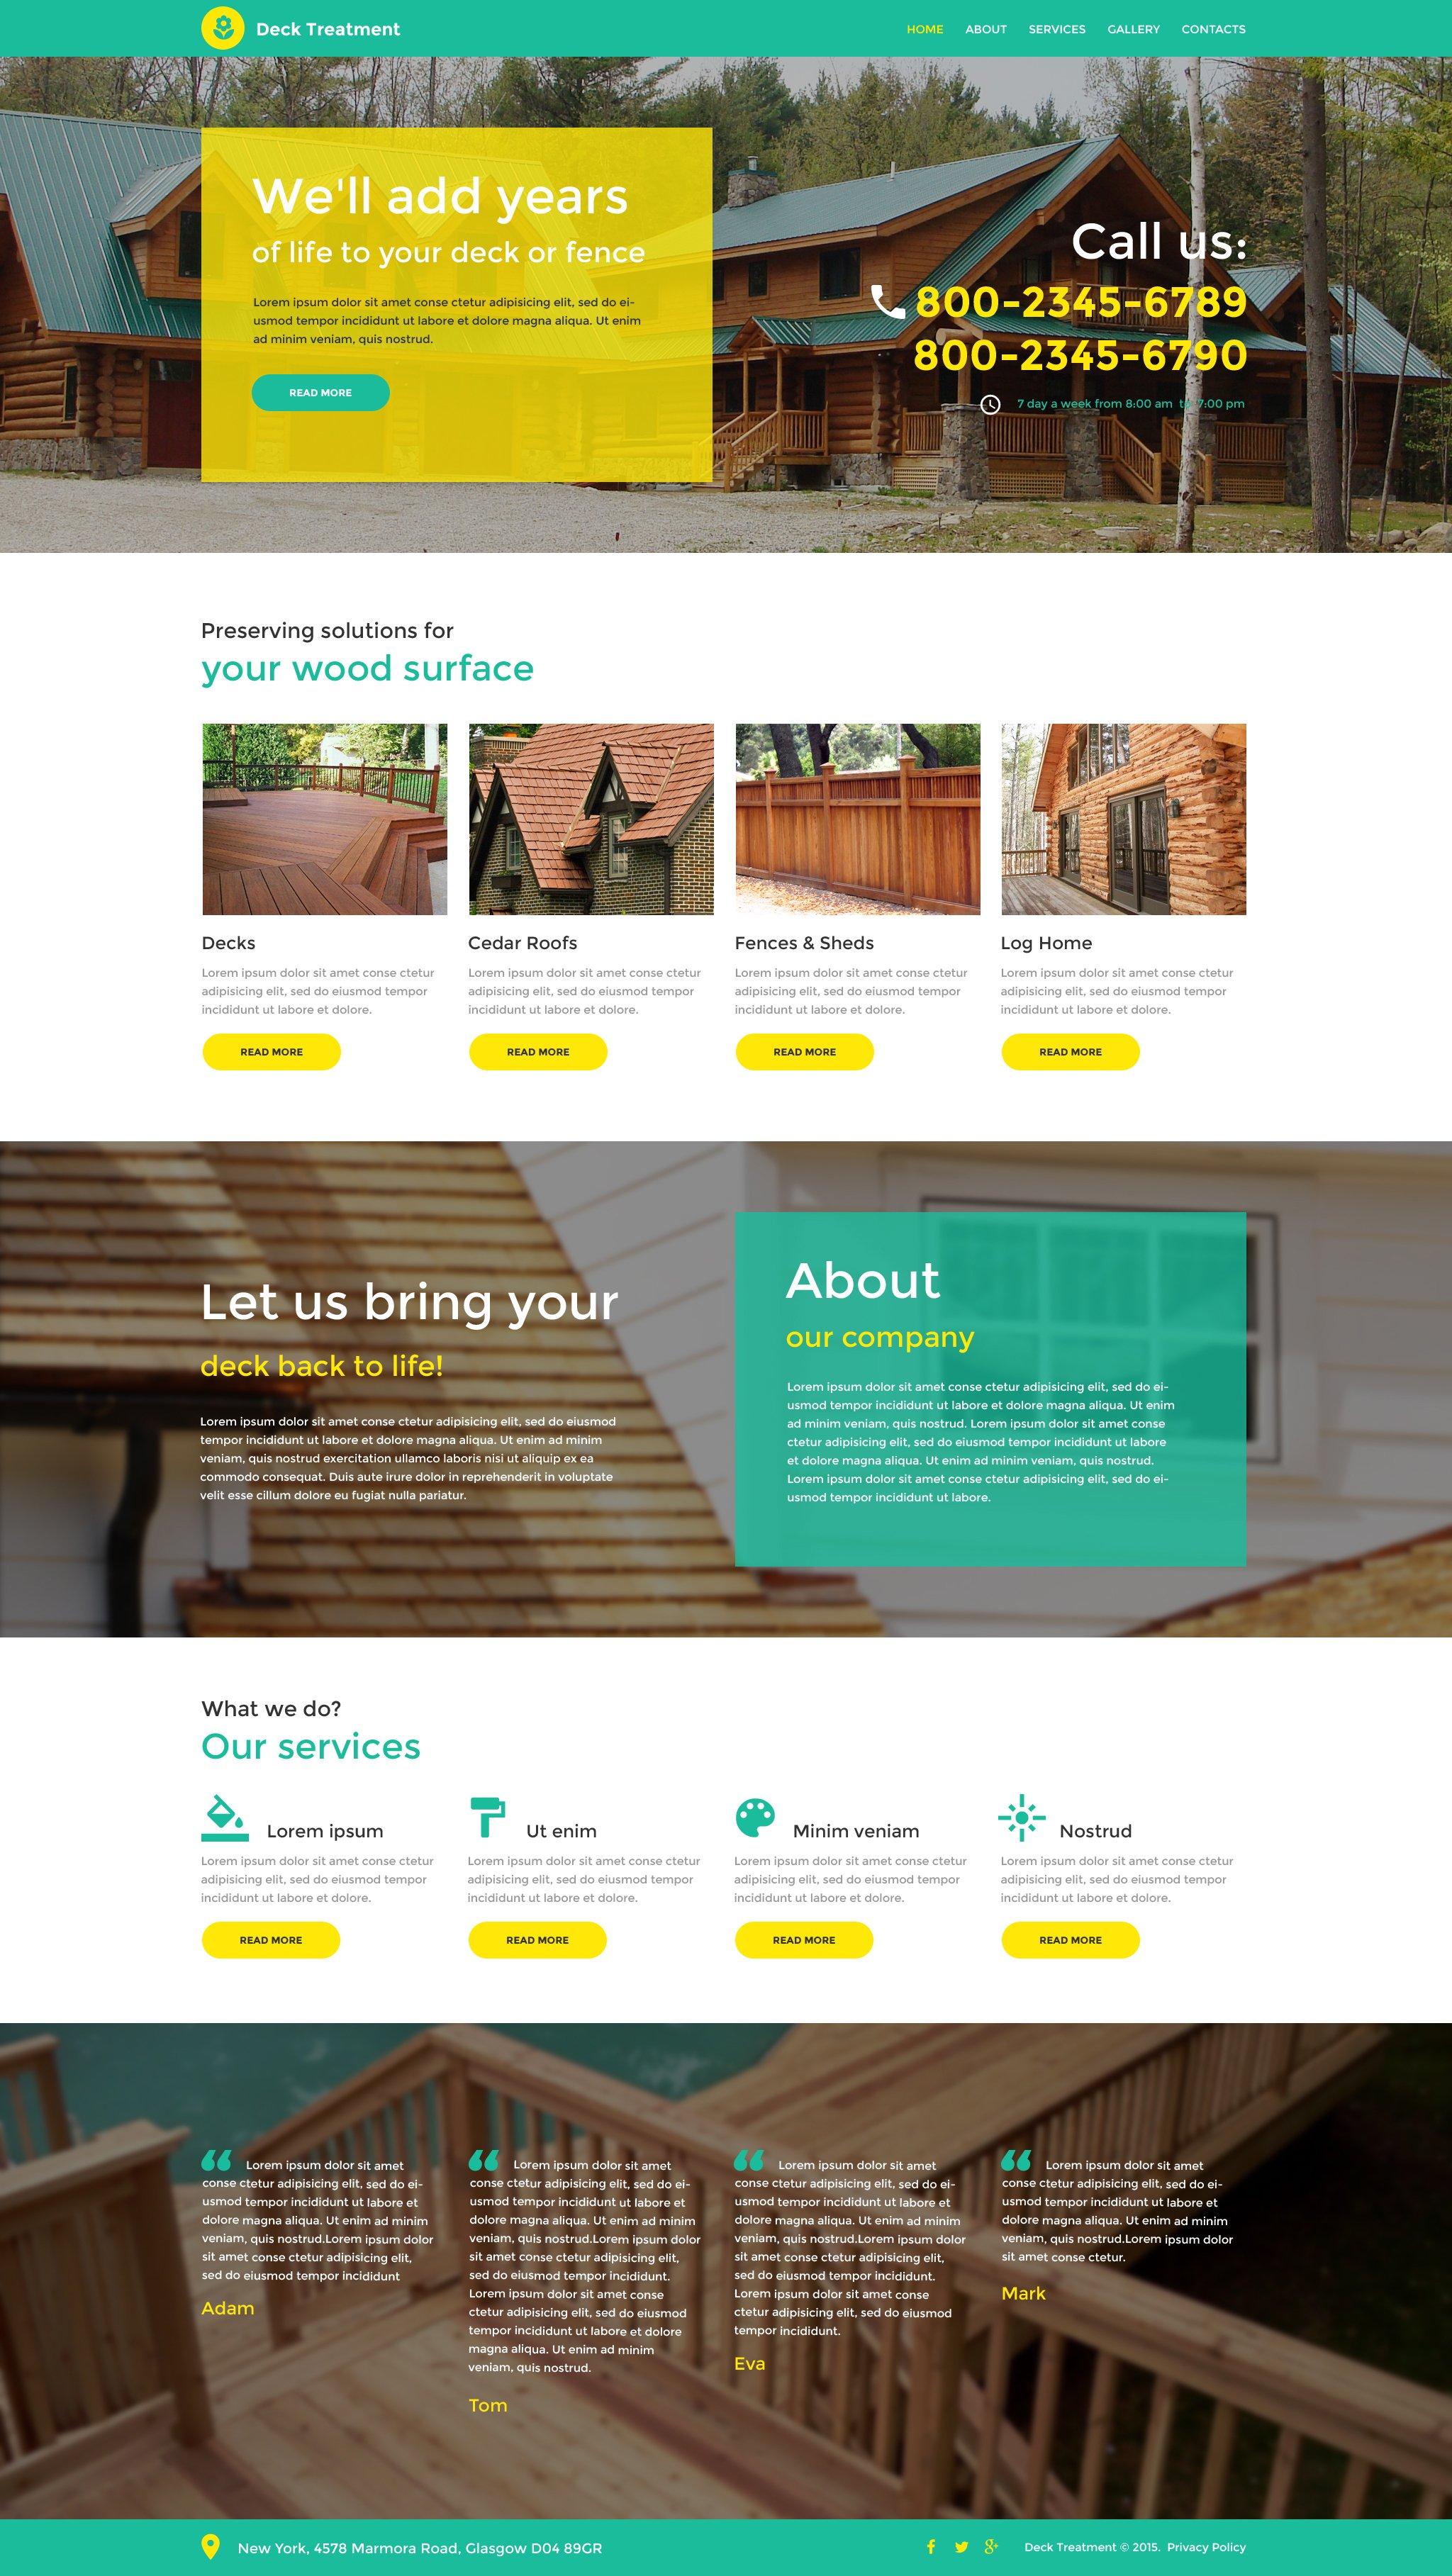 Plantilla Web Responsive para Sitio de Diseño interior #56073 - captura de pantalla